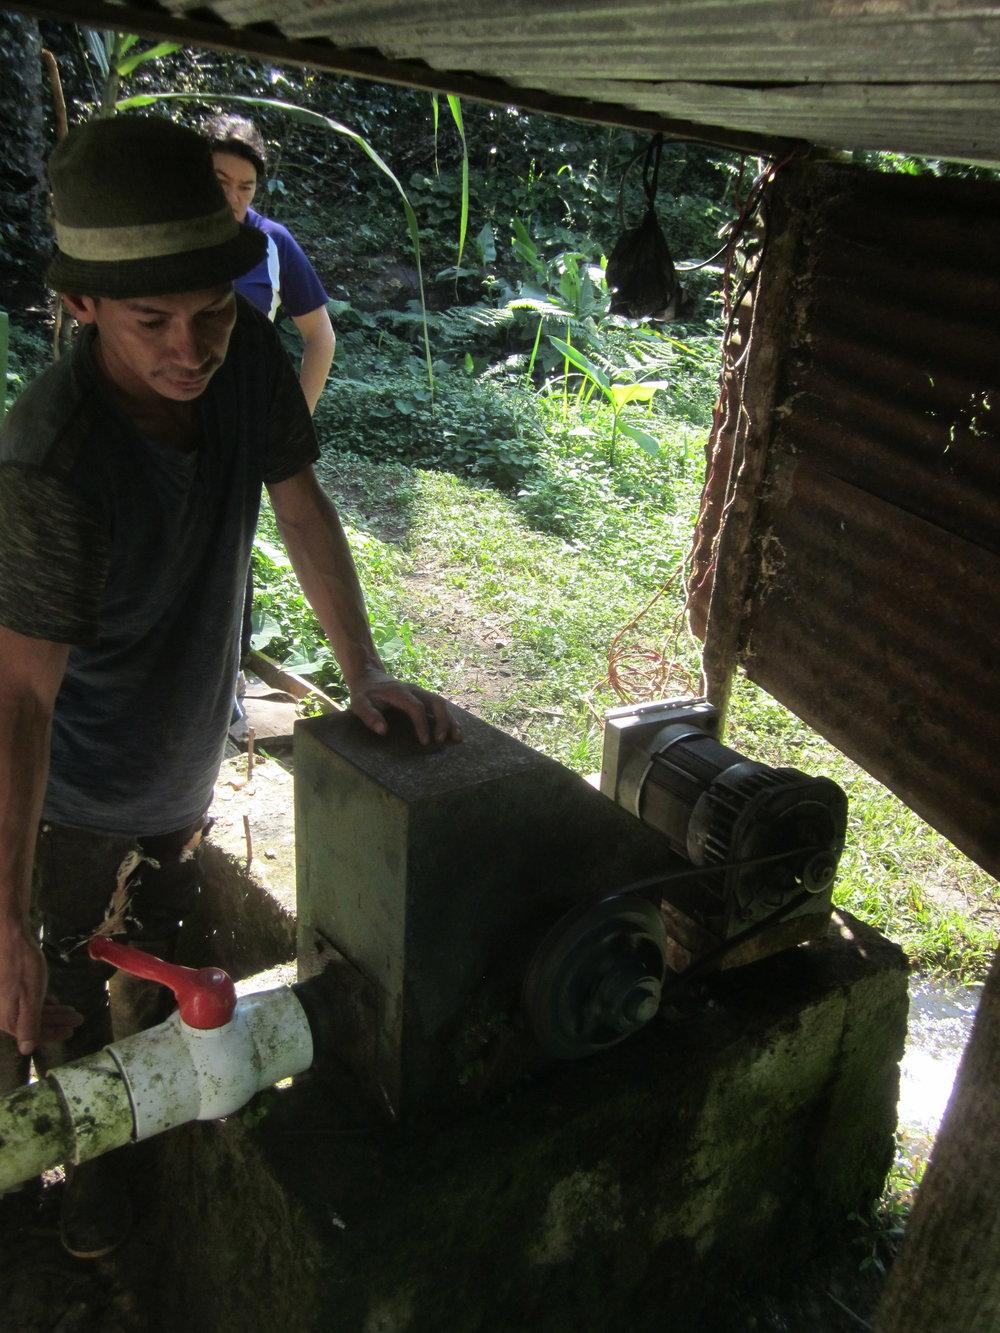 Inspecting the micro-turbine.